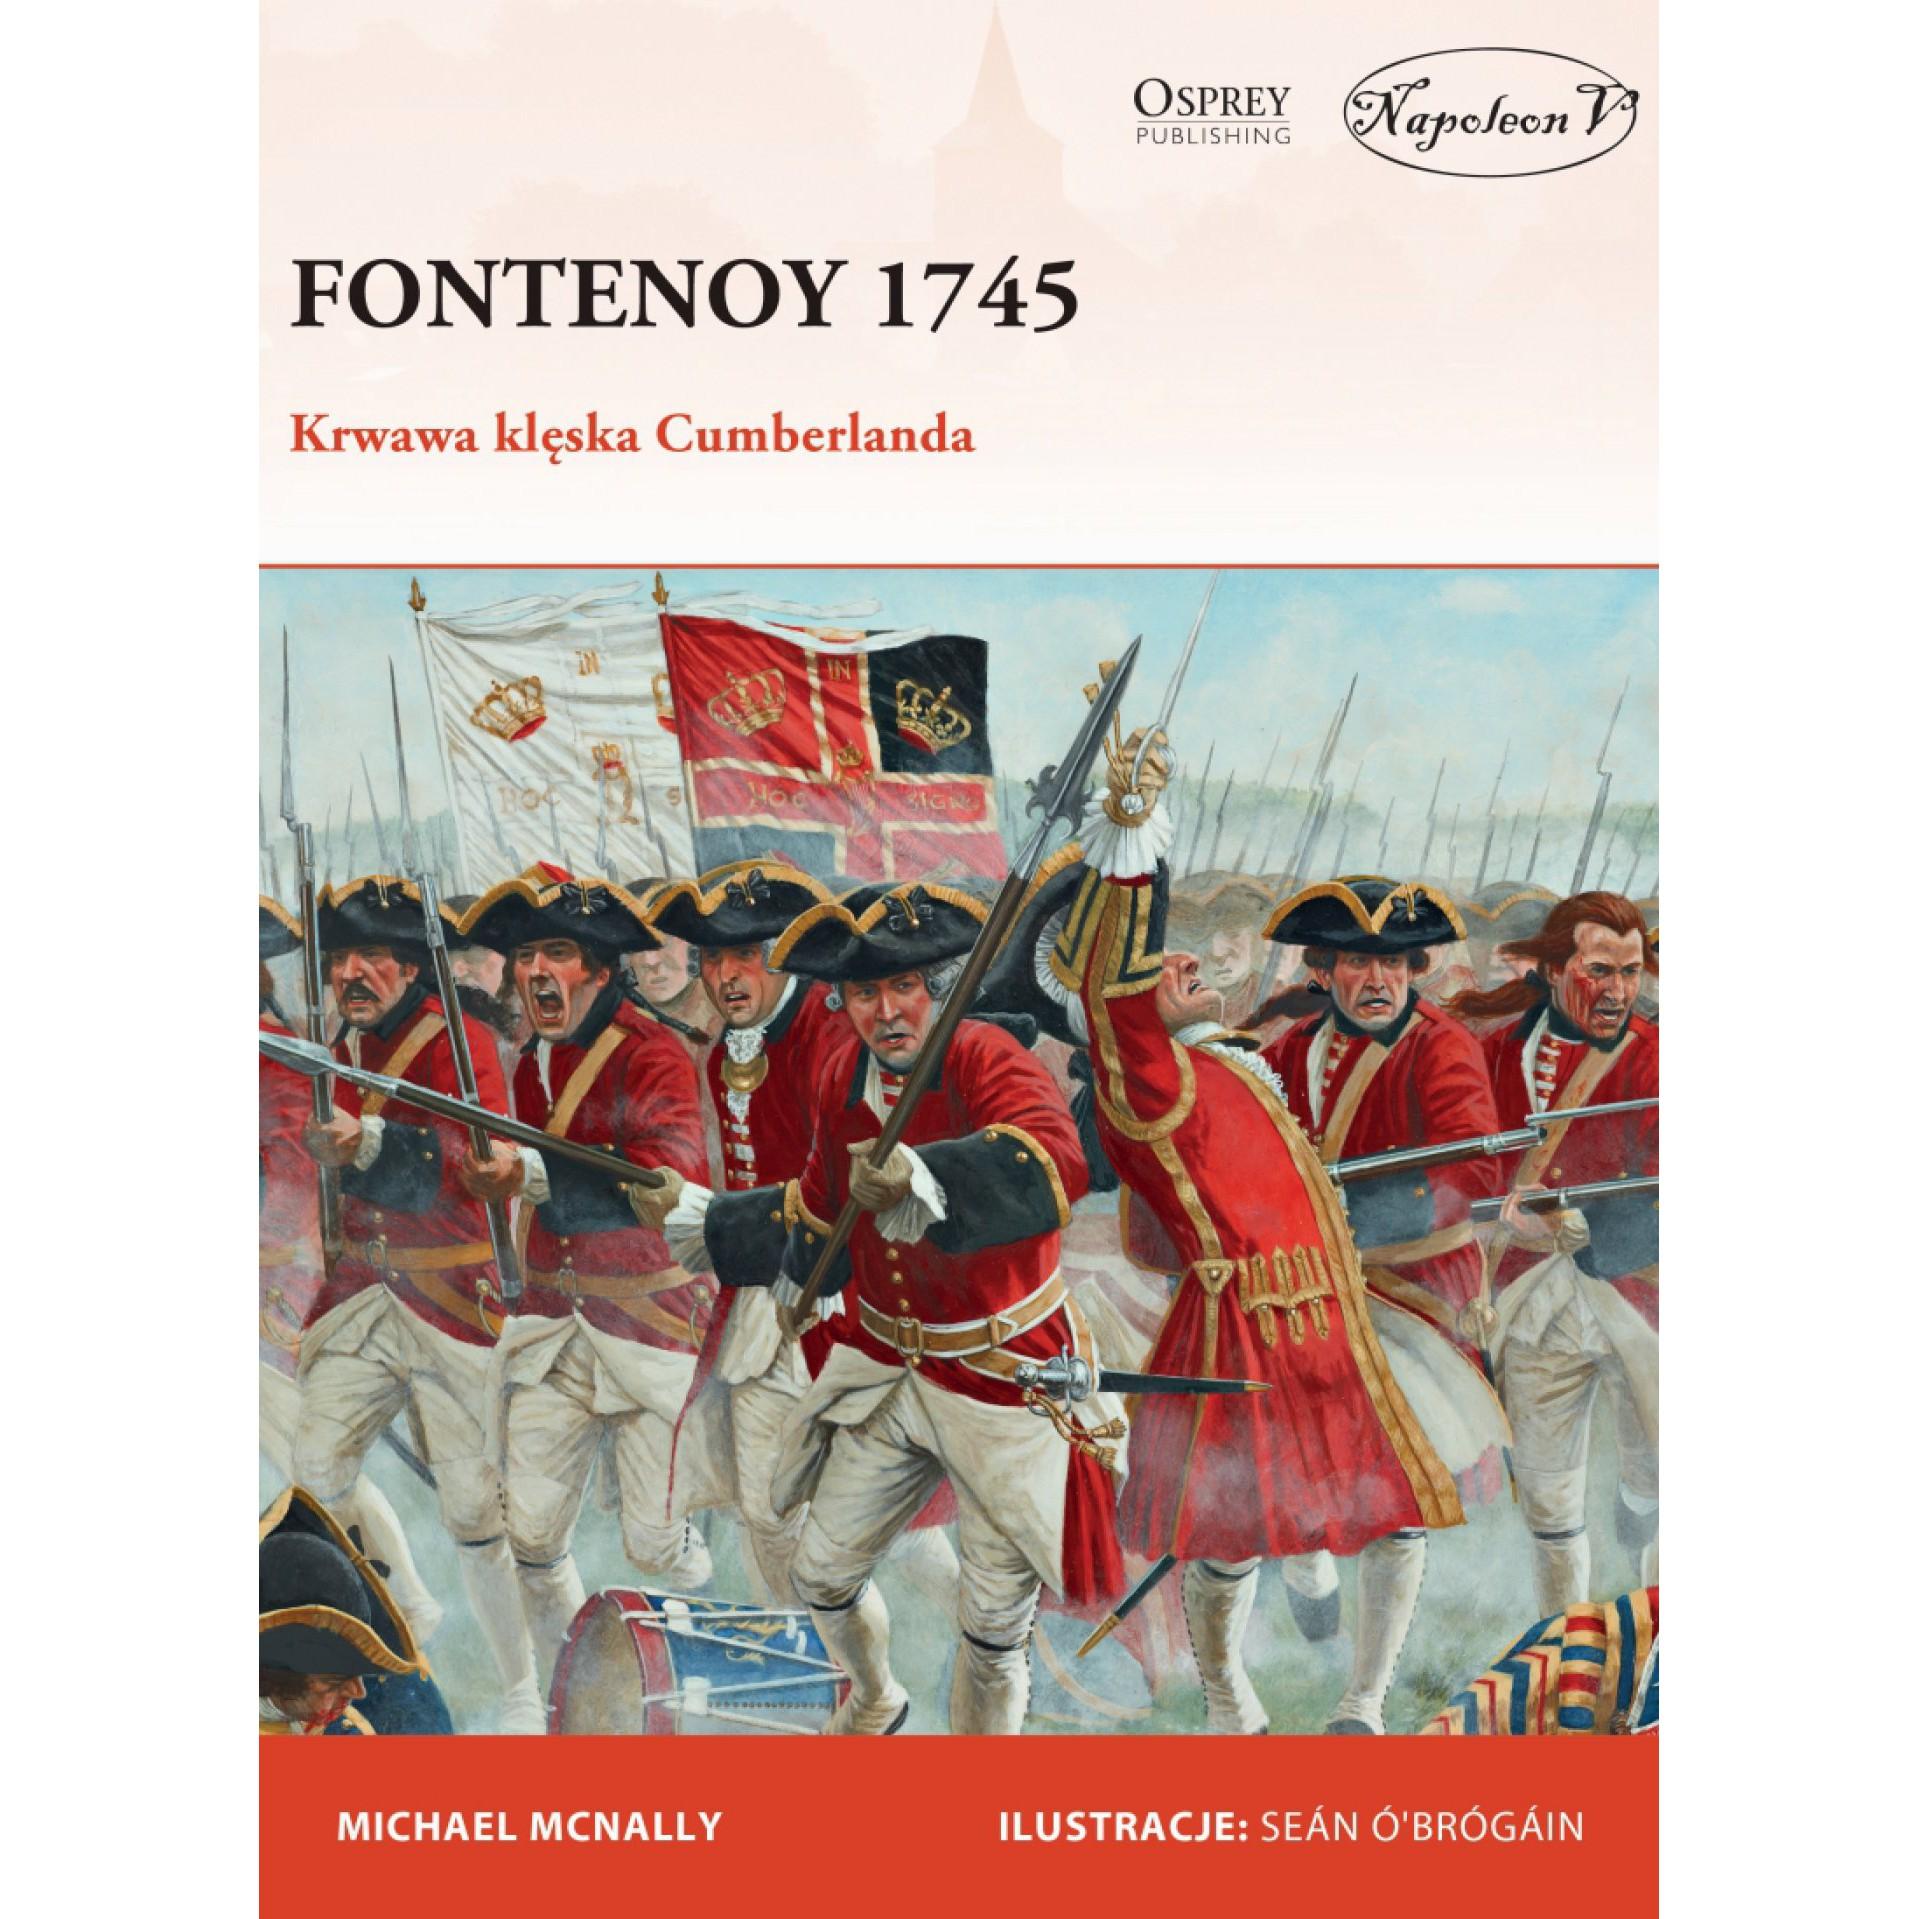 Fontenoy 1745. Krwawa klęska Cumberlanda